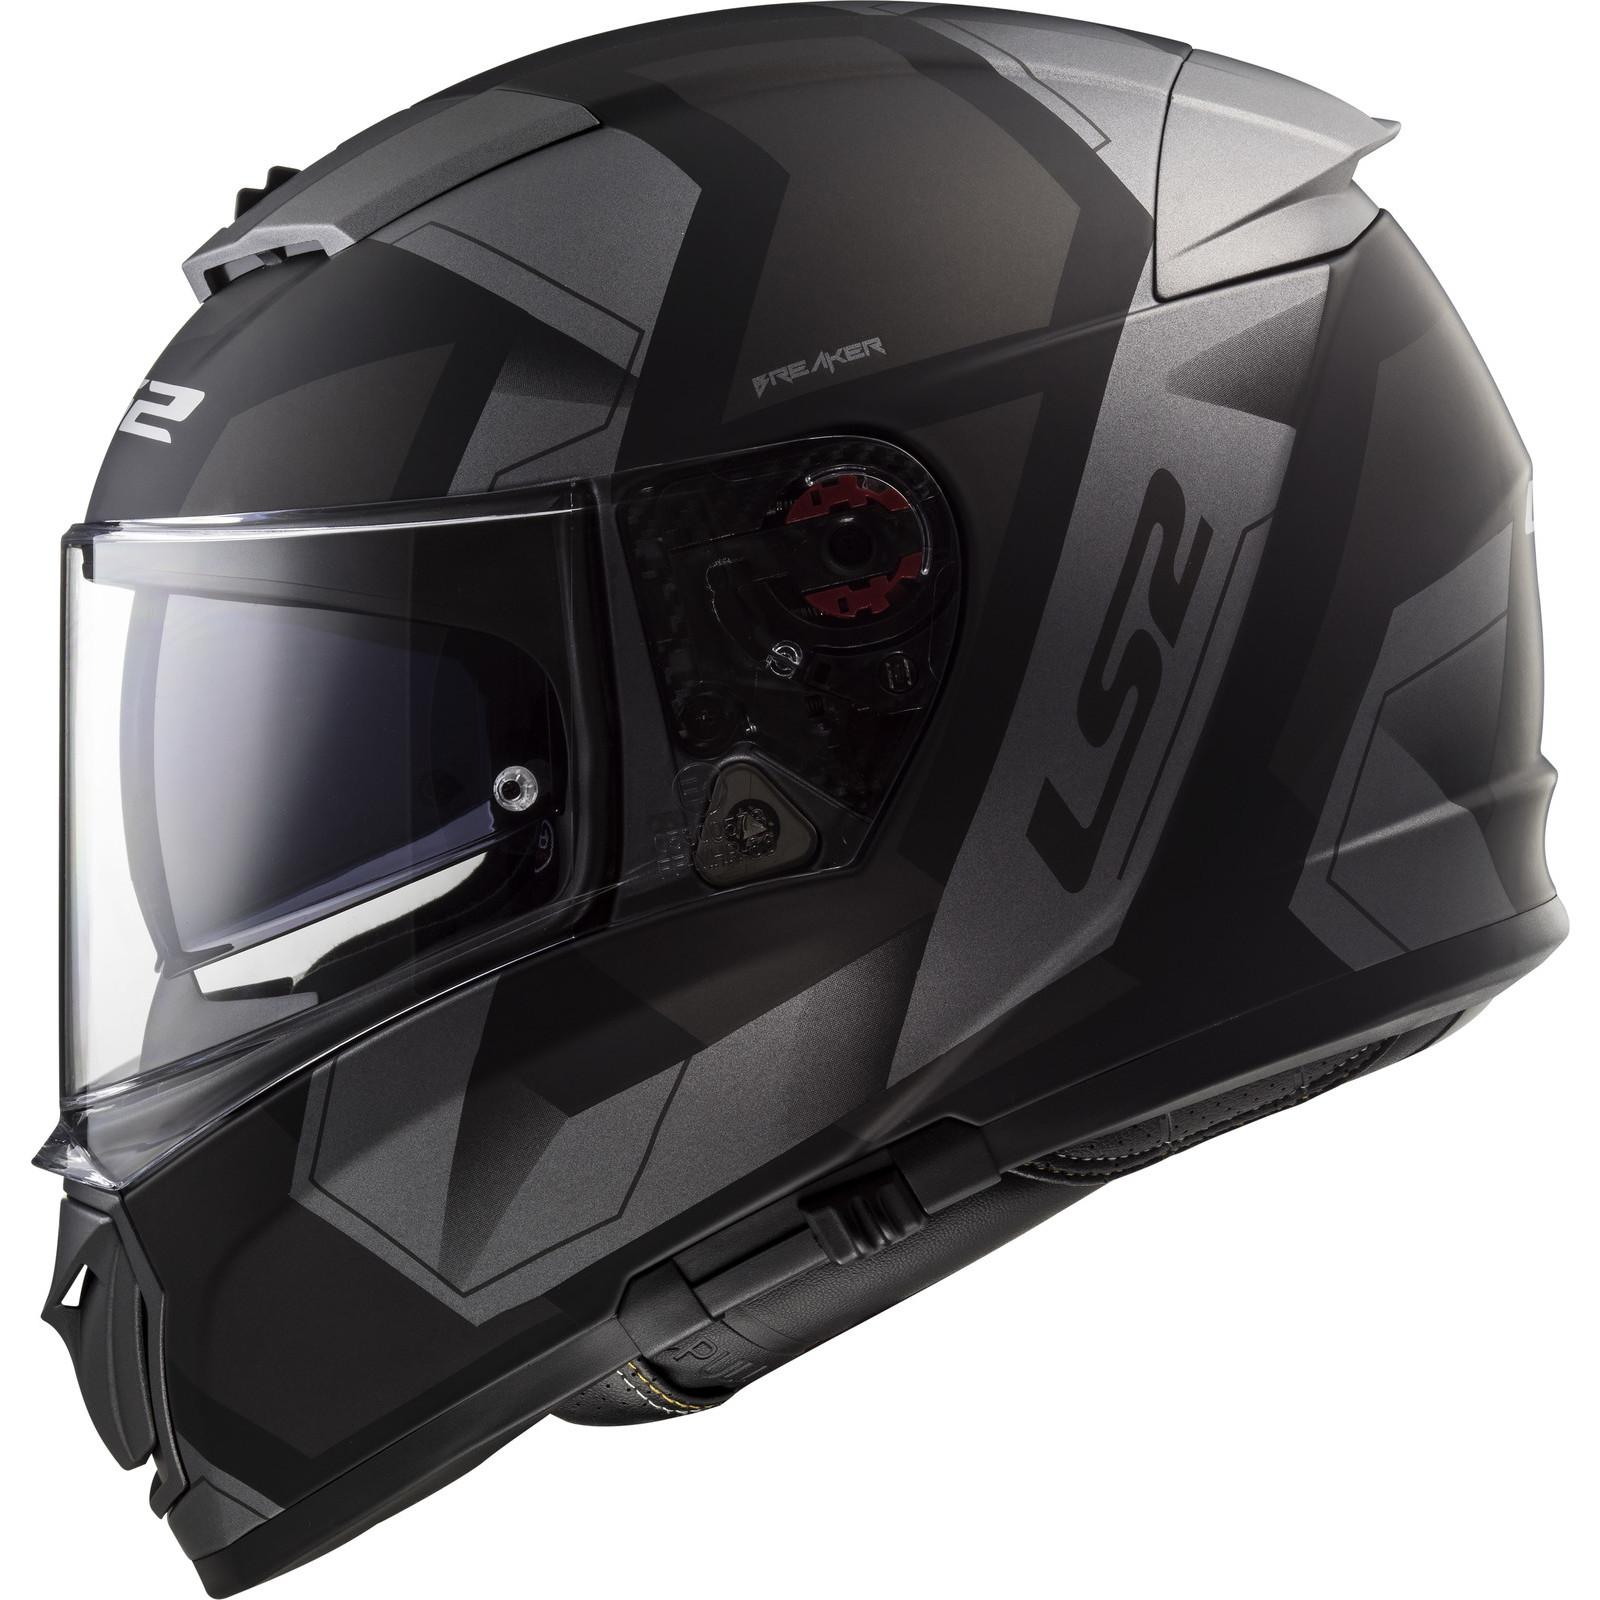 666d5ca6 LS2 FF390 Breaker Physics Motorcycle Helmet & Visor Motorbike Full ...